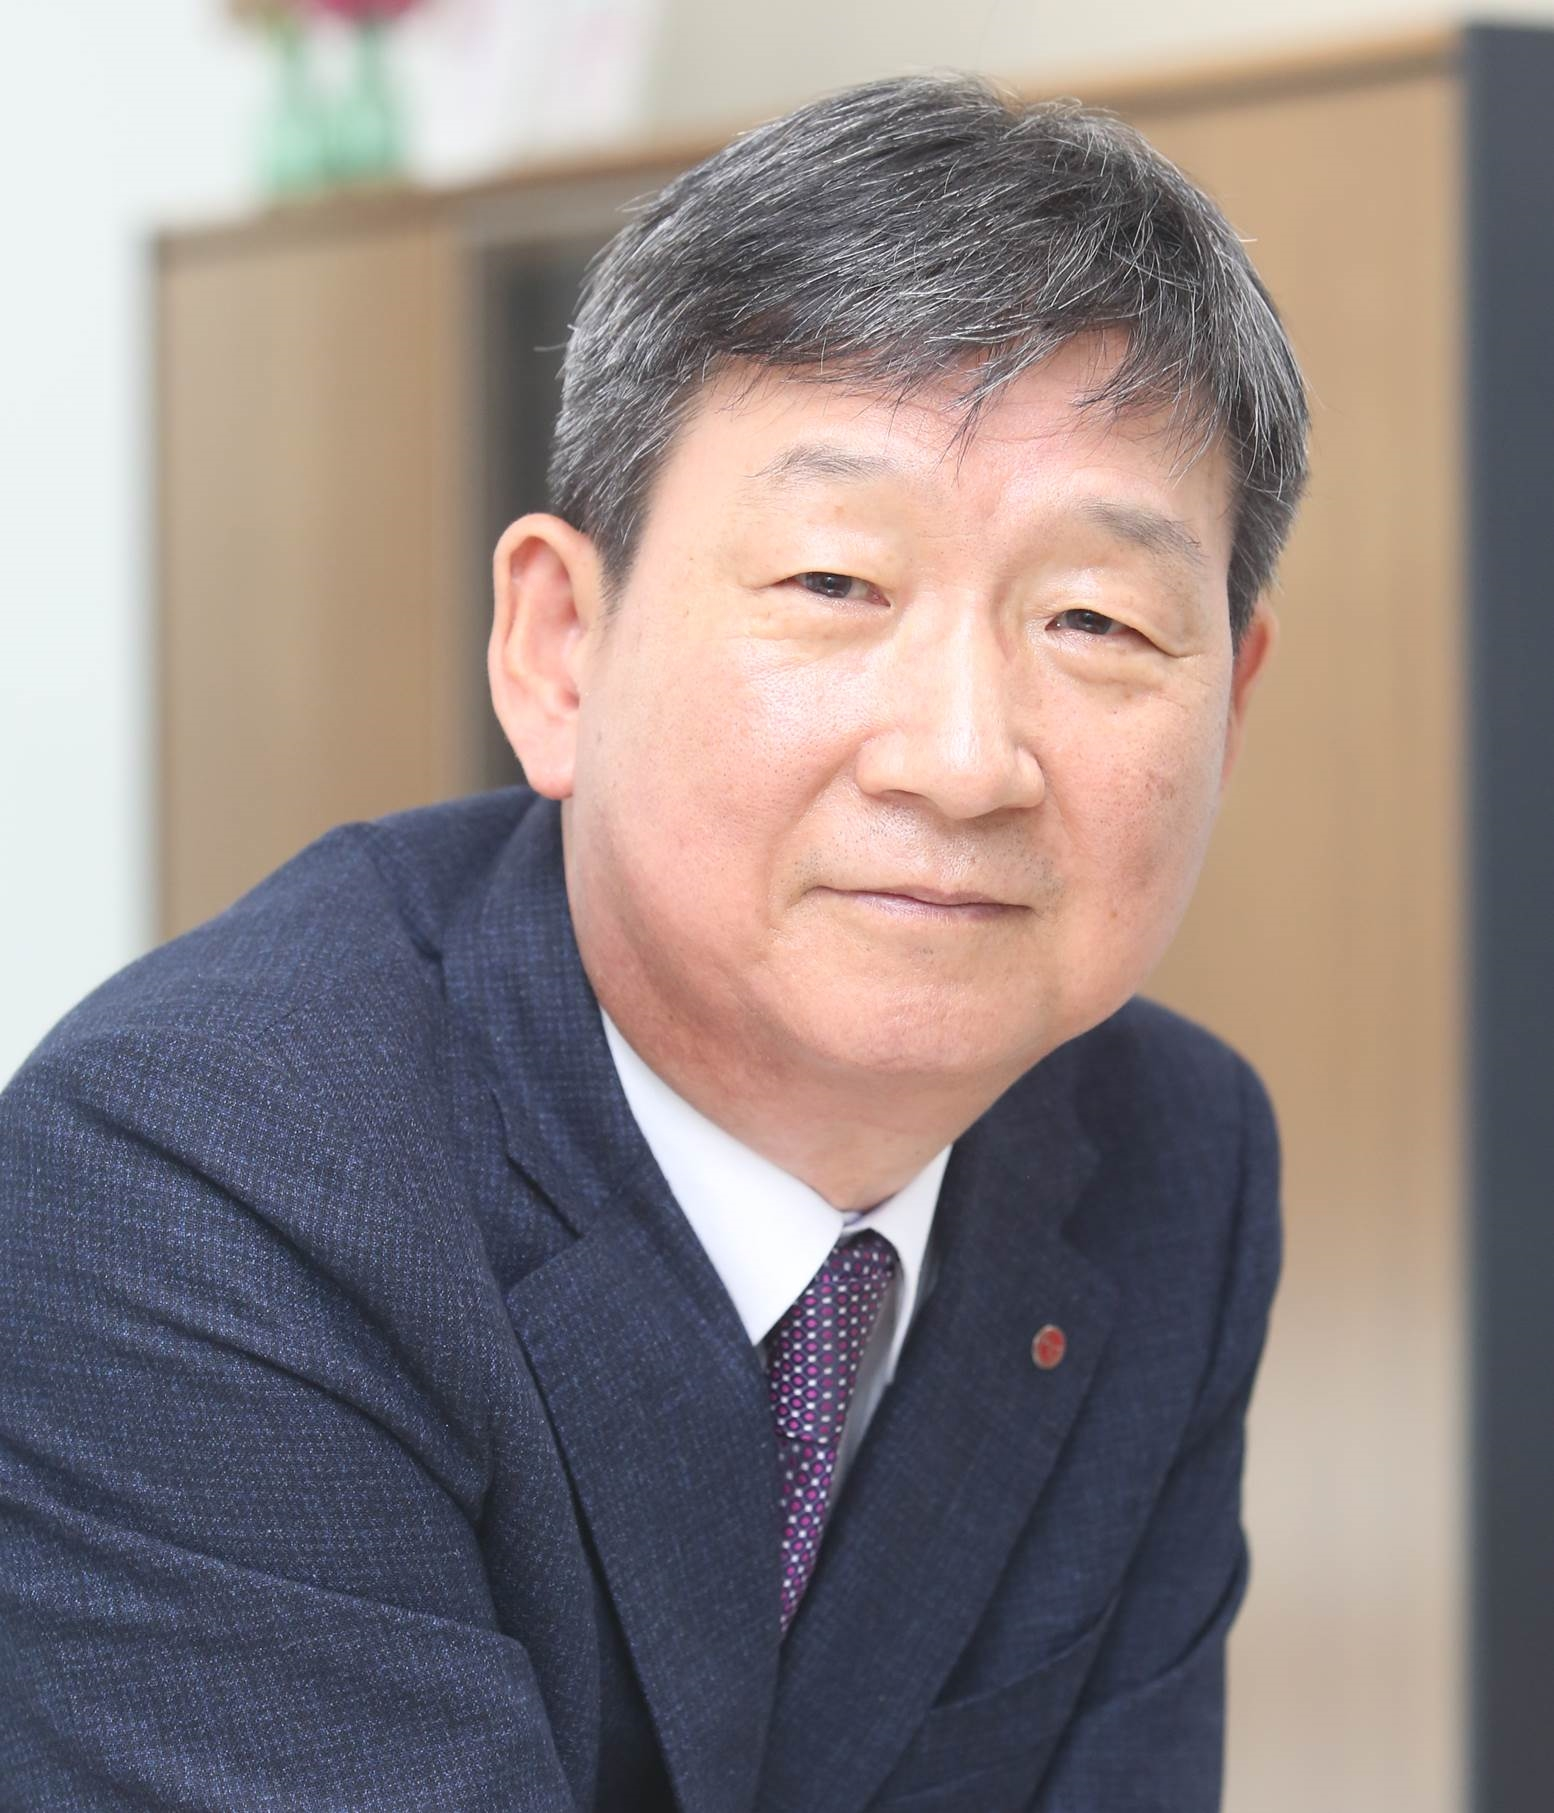 LG유플러스, 새 신임 대표로 황현식 사장 선임